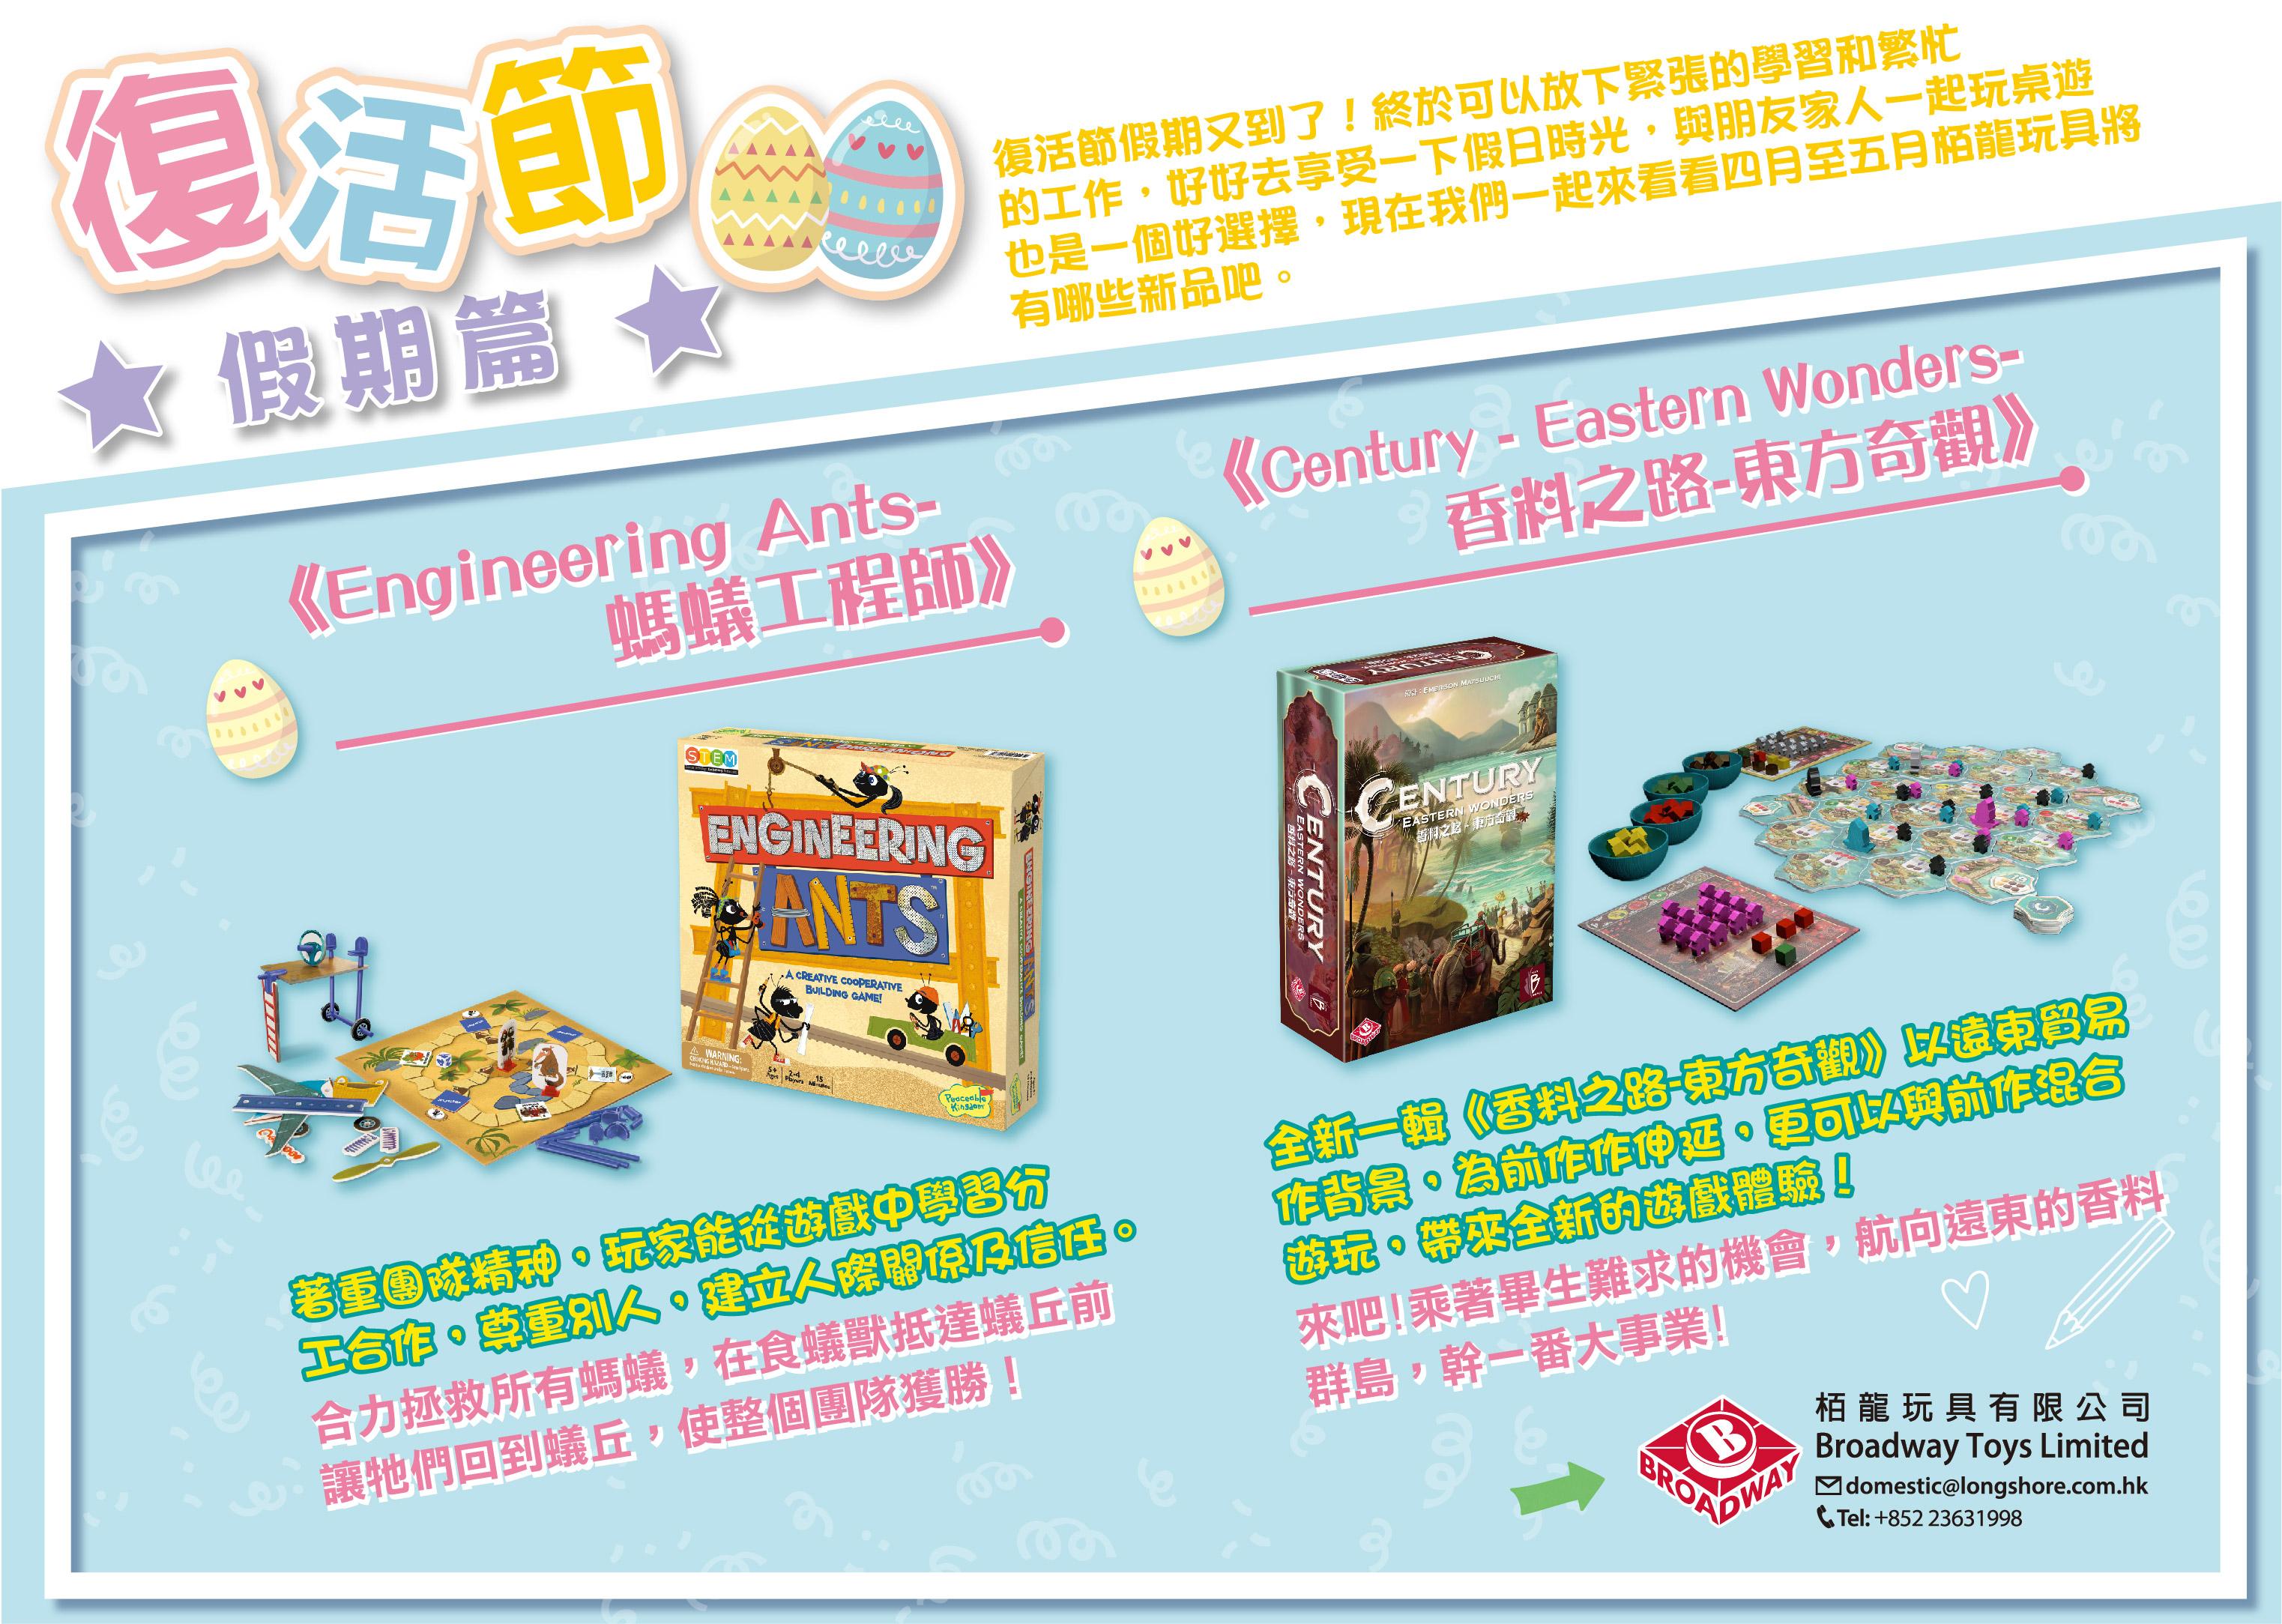 http://broadwaygames.com.hk/wp-content/uploads/2018/03/復活節假期篇_3rd-01.jpg